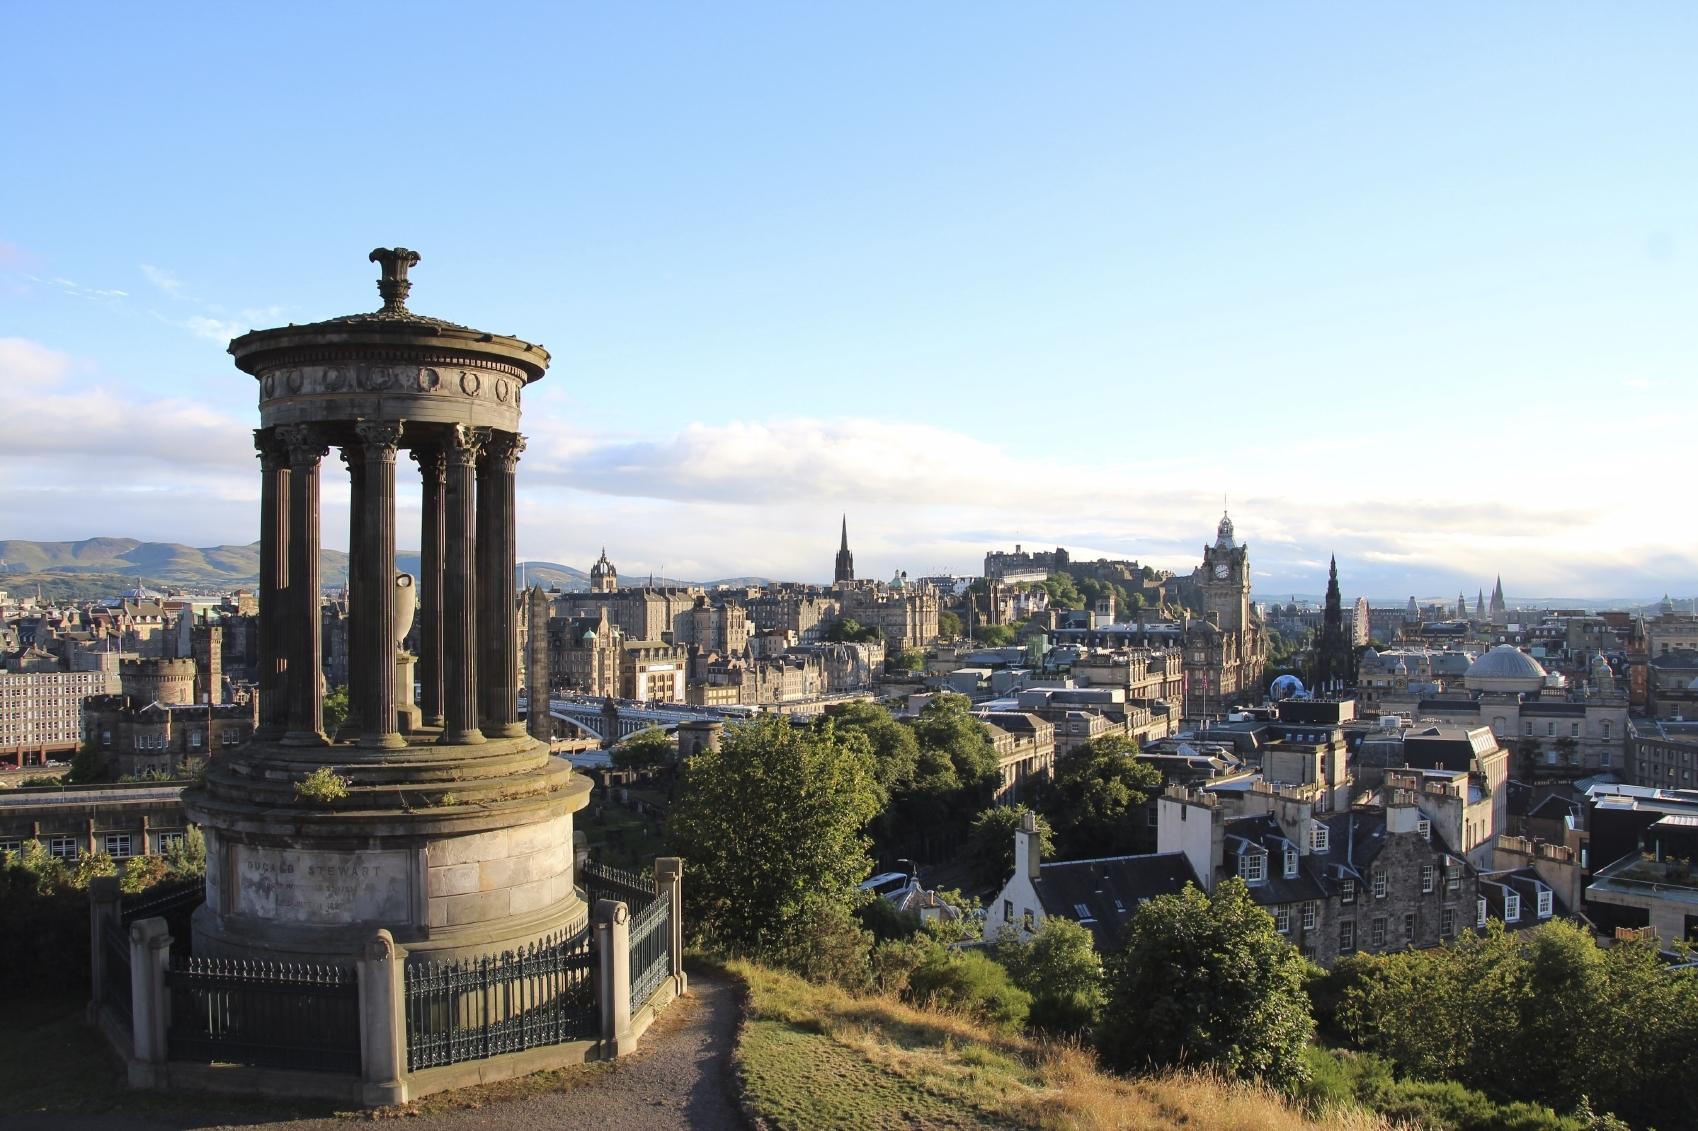 Edinburgh (Getty Images)